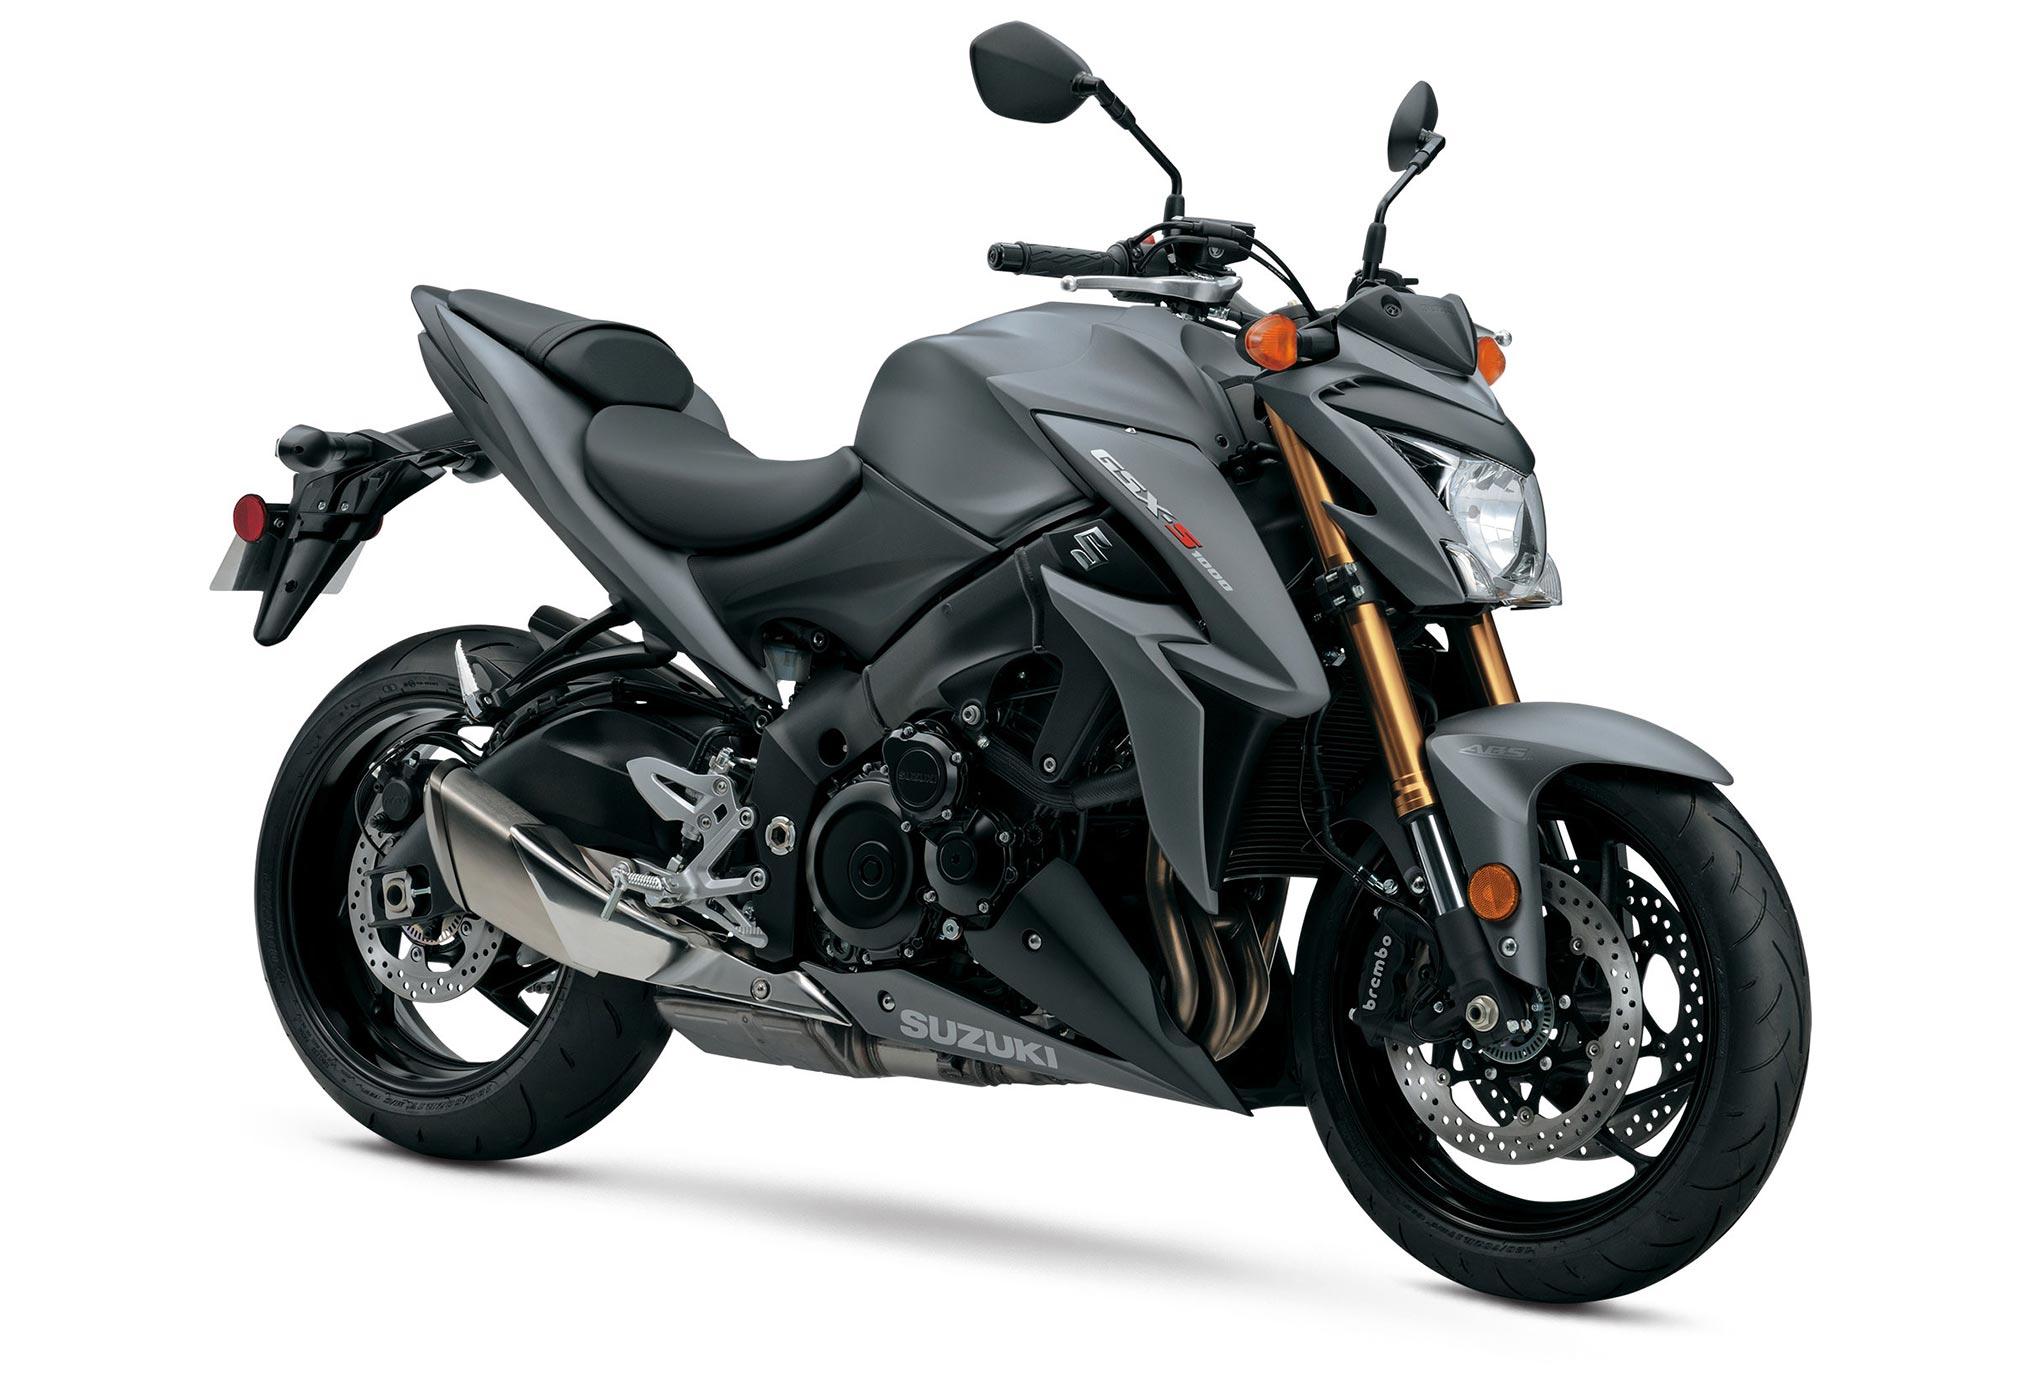 Stylish Bike Suzuki Gsx S1000 On A White Background Wallpapers And